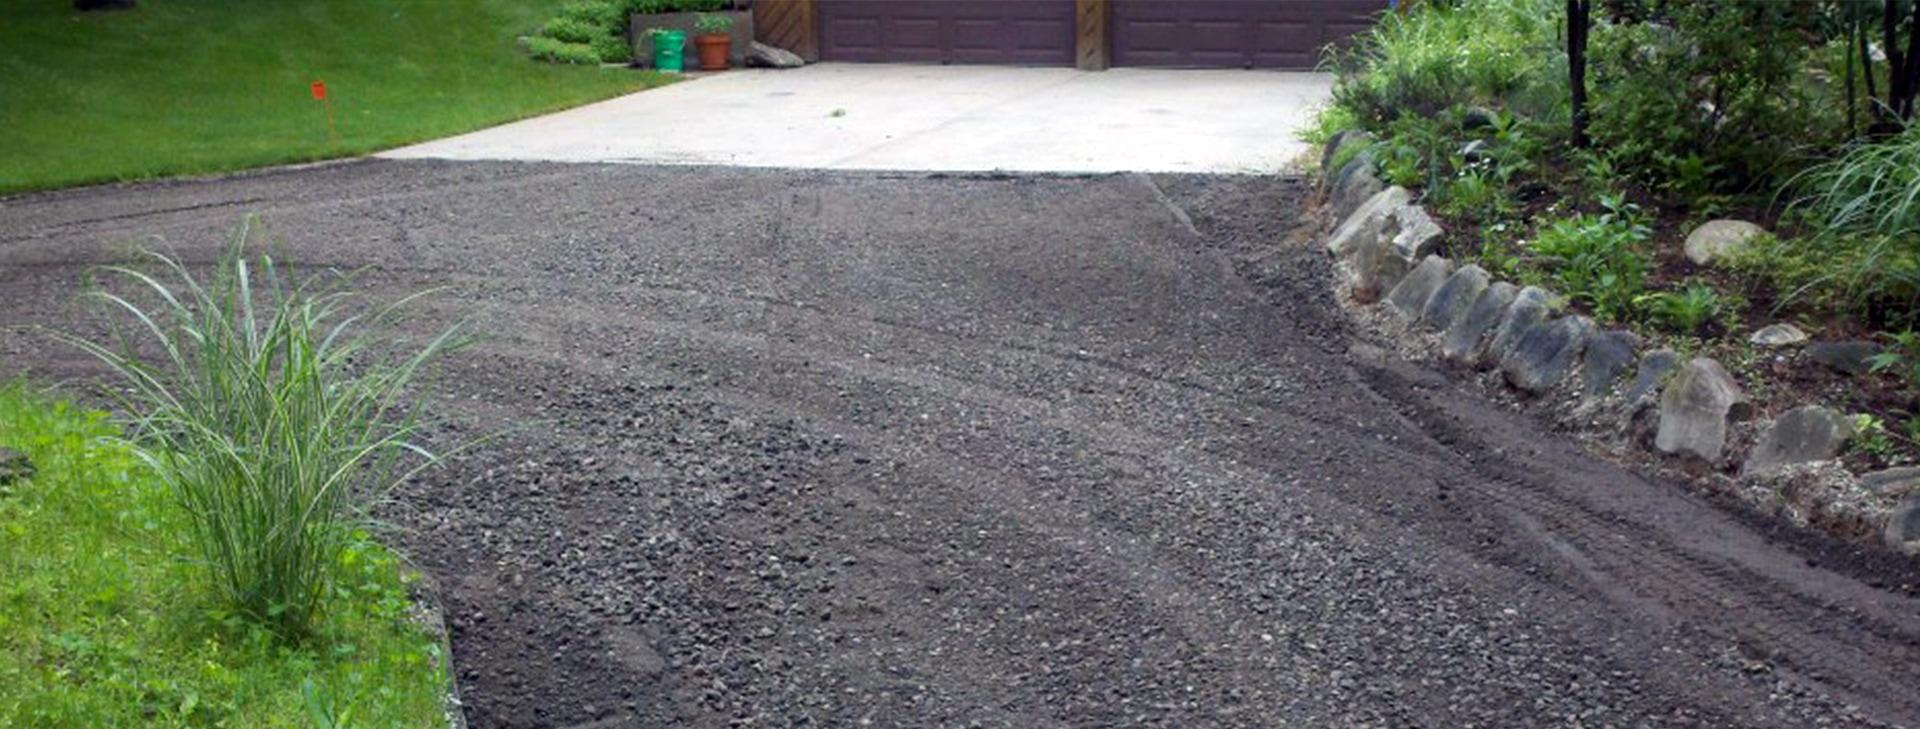 Muskegon Mi Driveway Construction